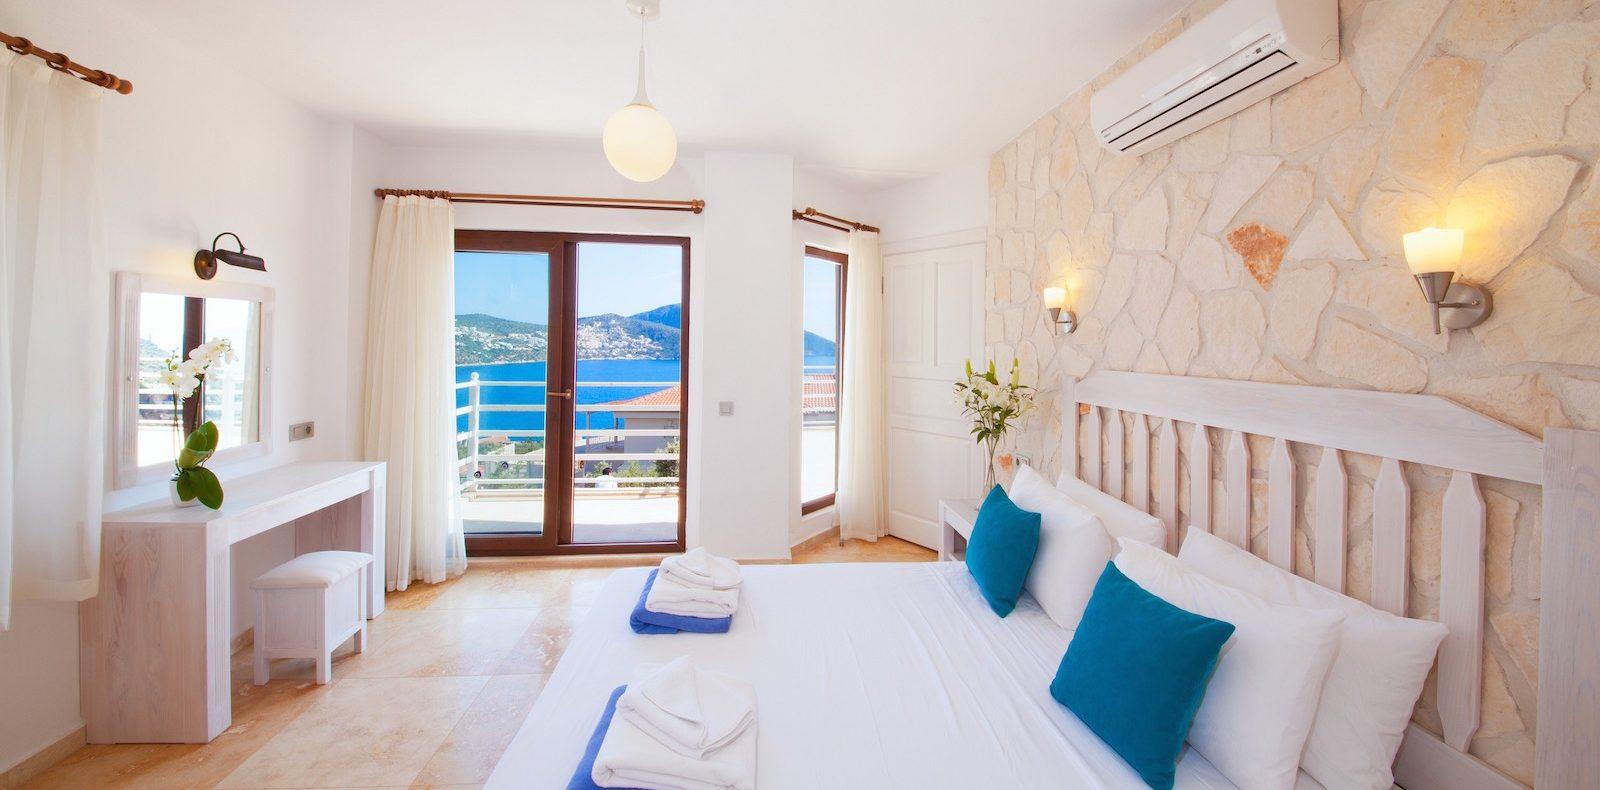 Luxurious villas in Kakan